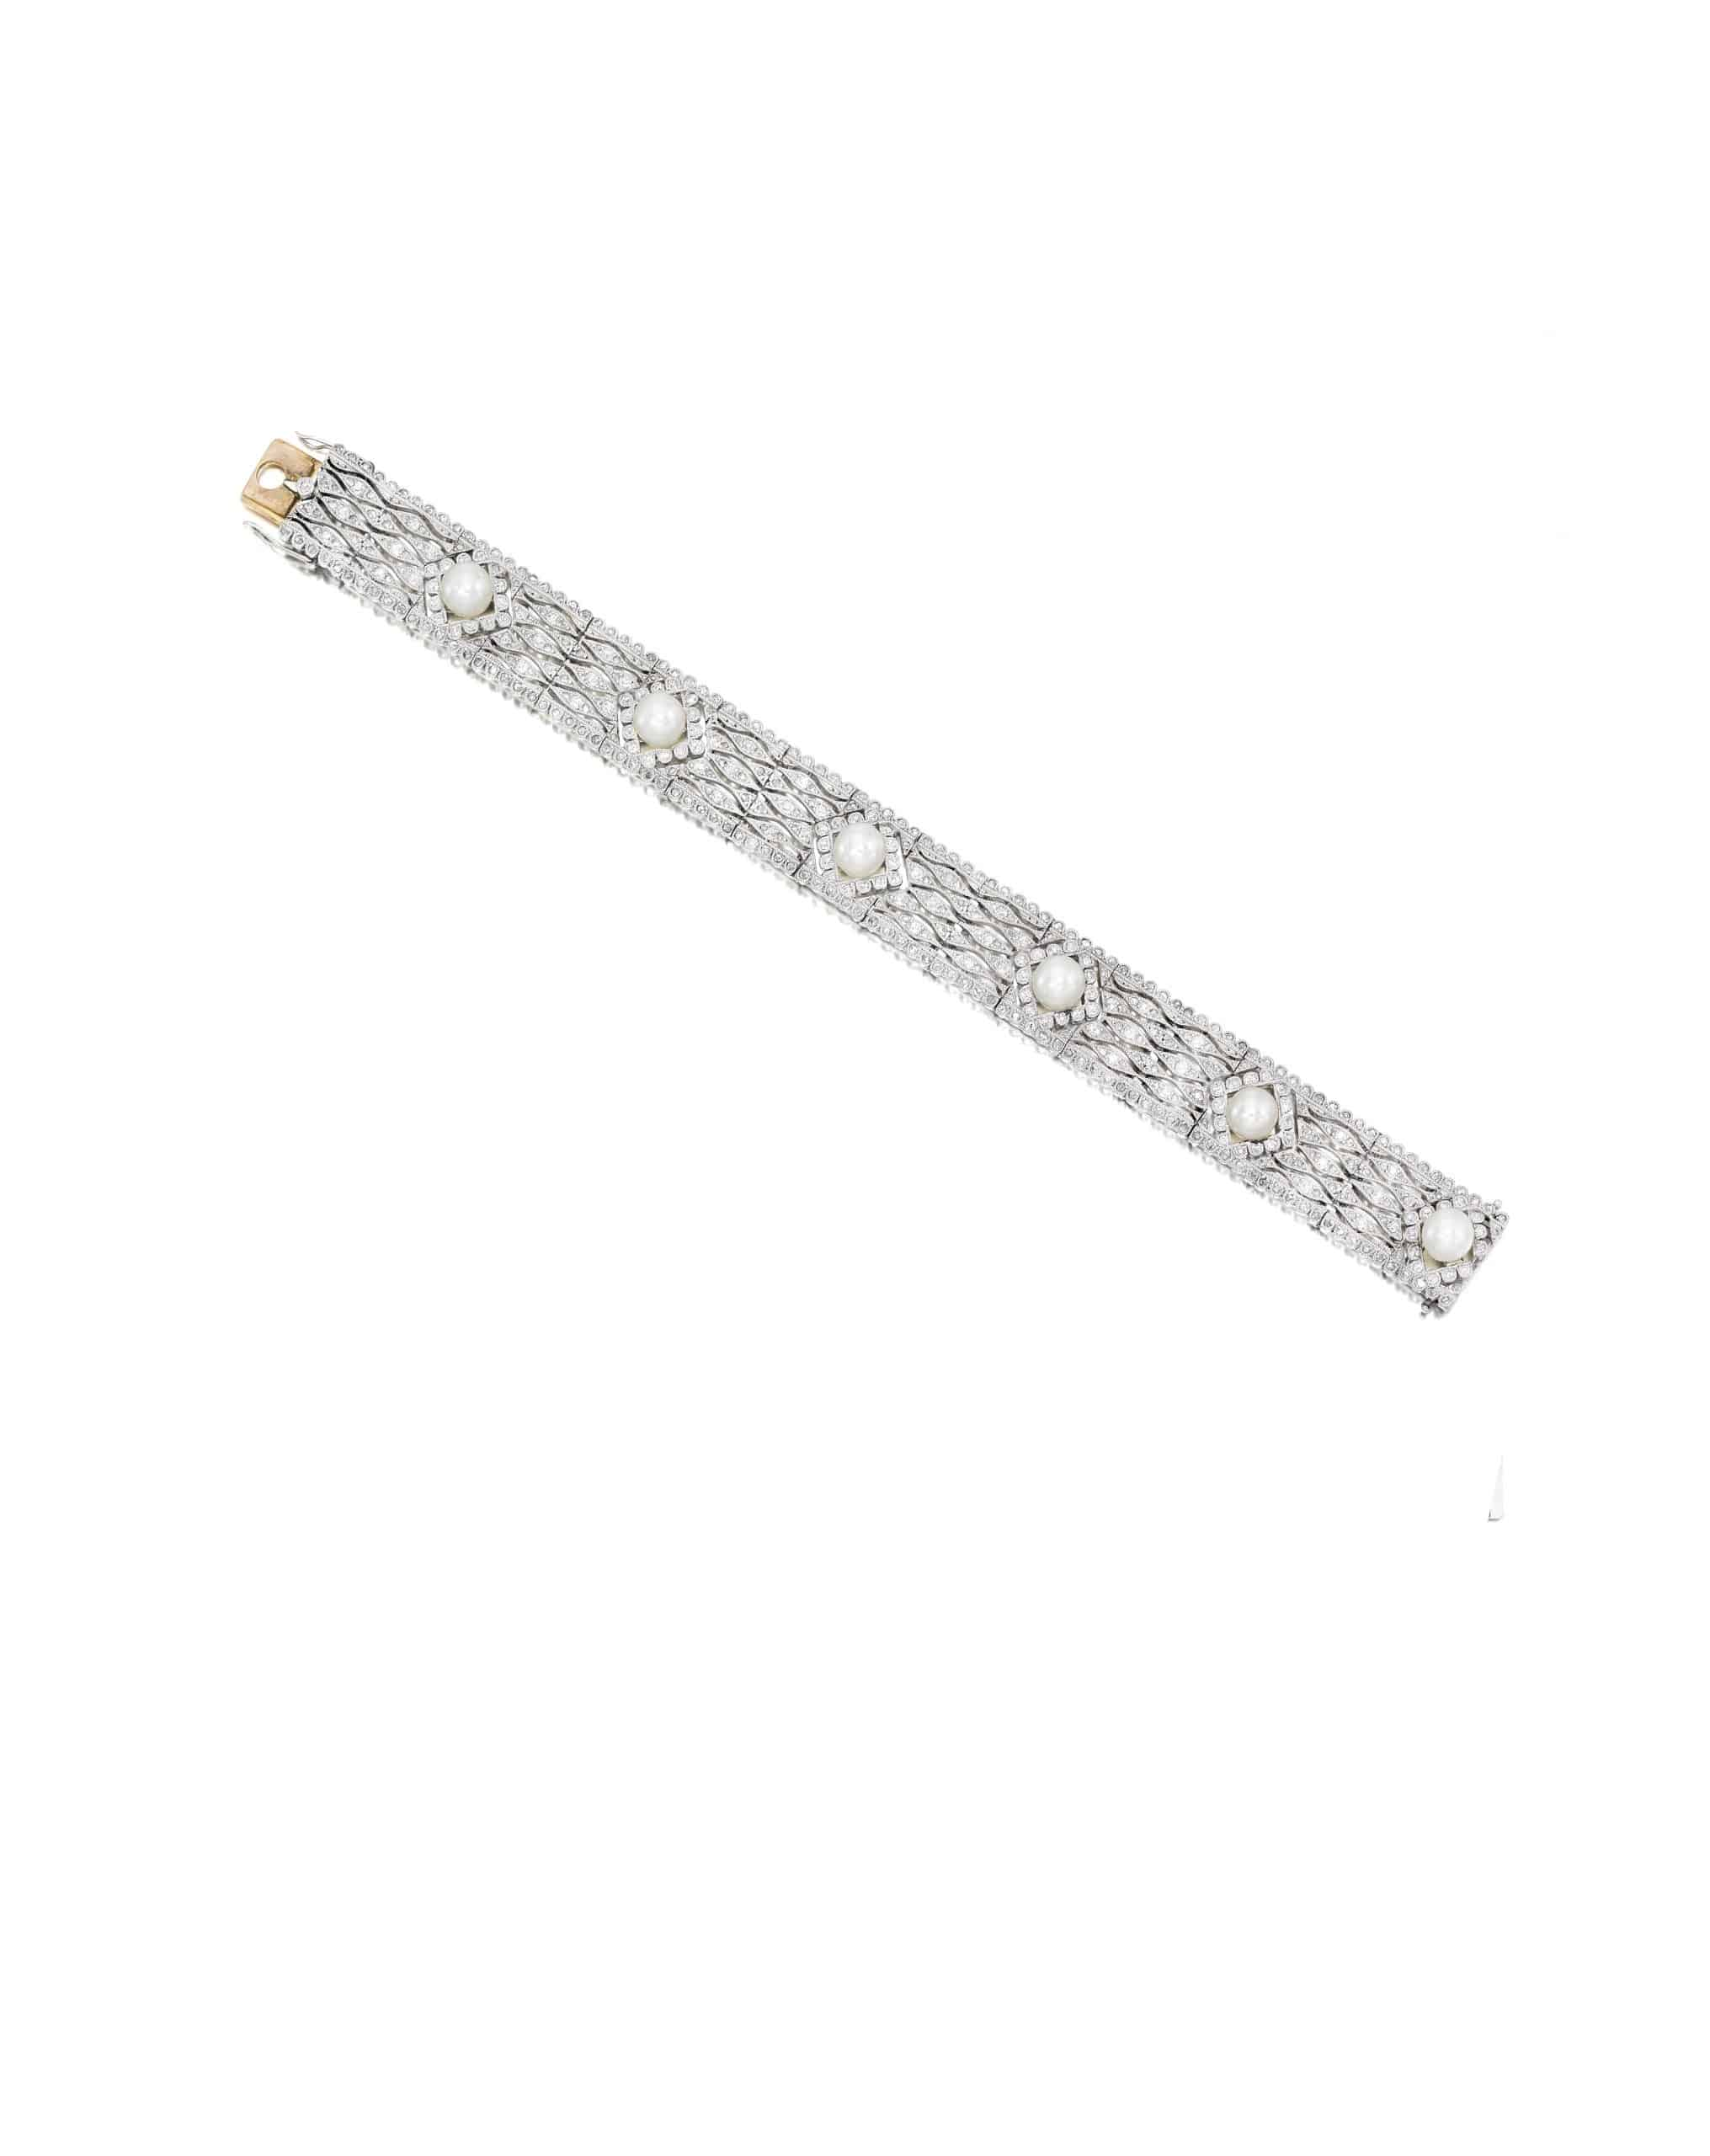 platinum, diamond and cultured pearl bracelet